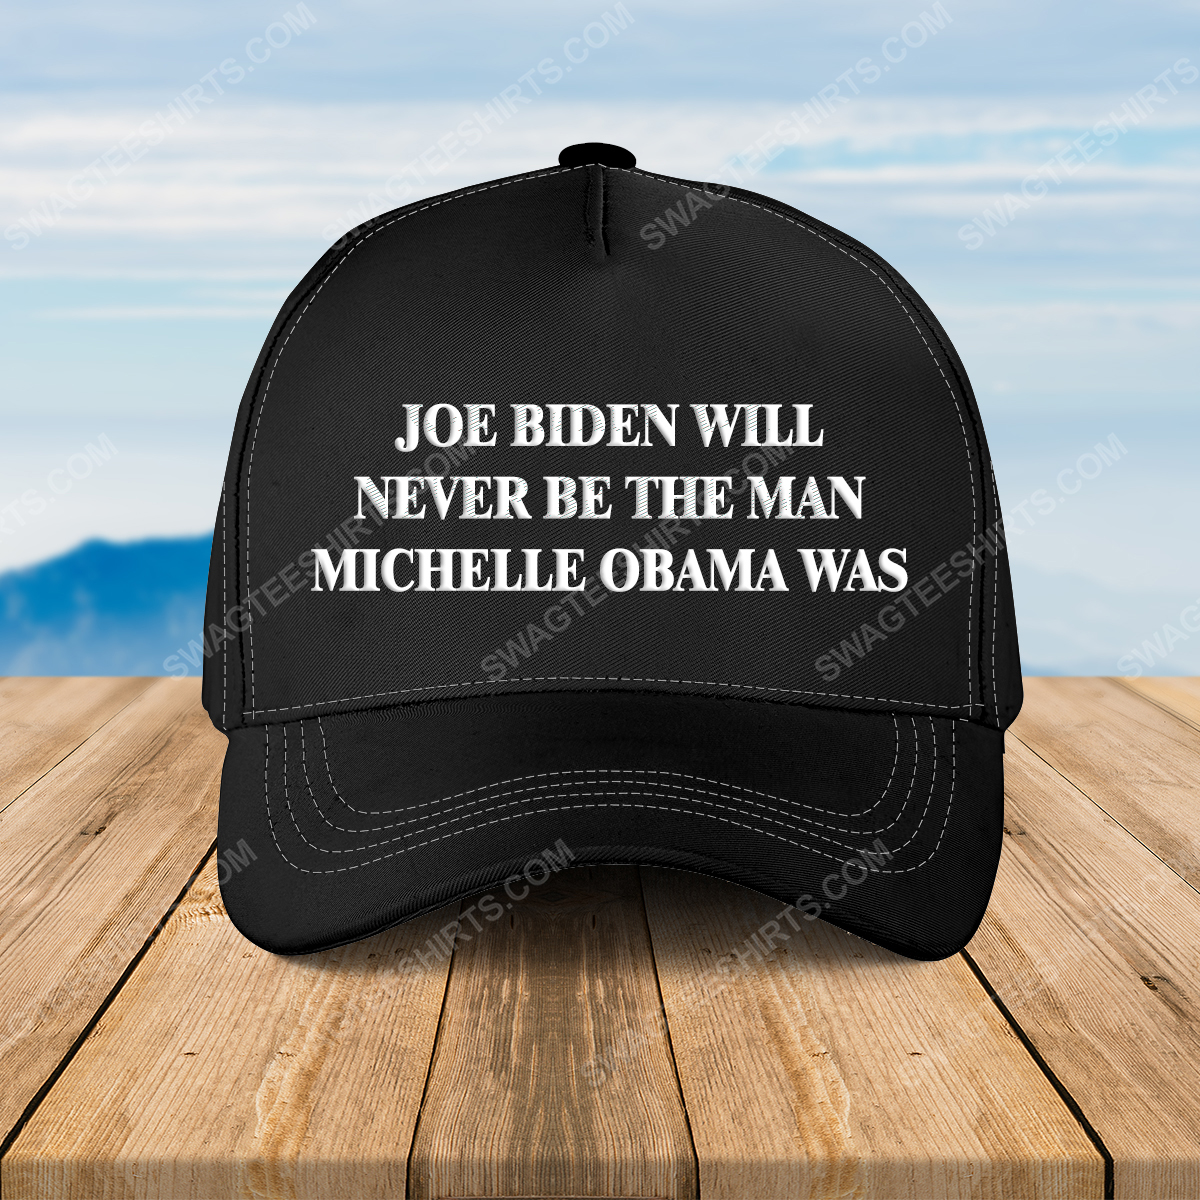 Joe biden will never be the man michelle obama was full print classic hat 1 - Copy (3)